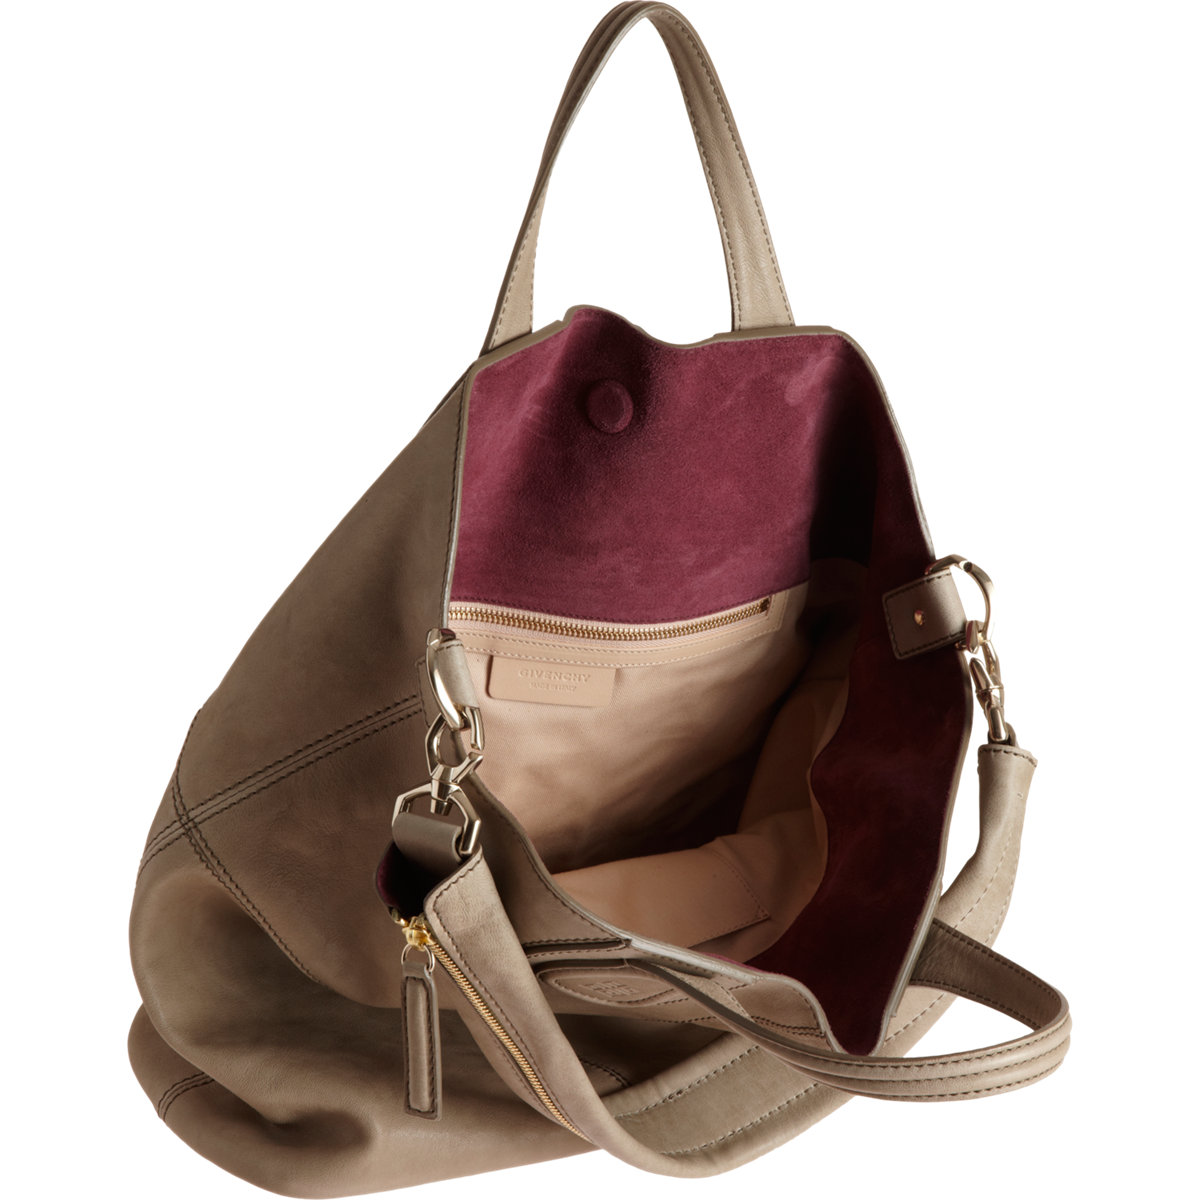 Givenchy Nightingale Zanzi Shopper Tote in Natural - Lyst ec0aa5a9992fb